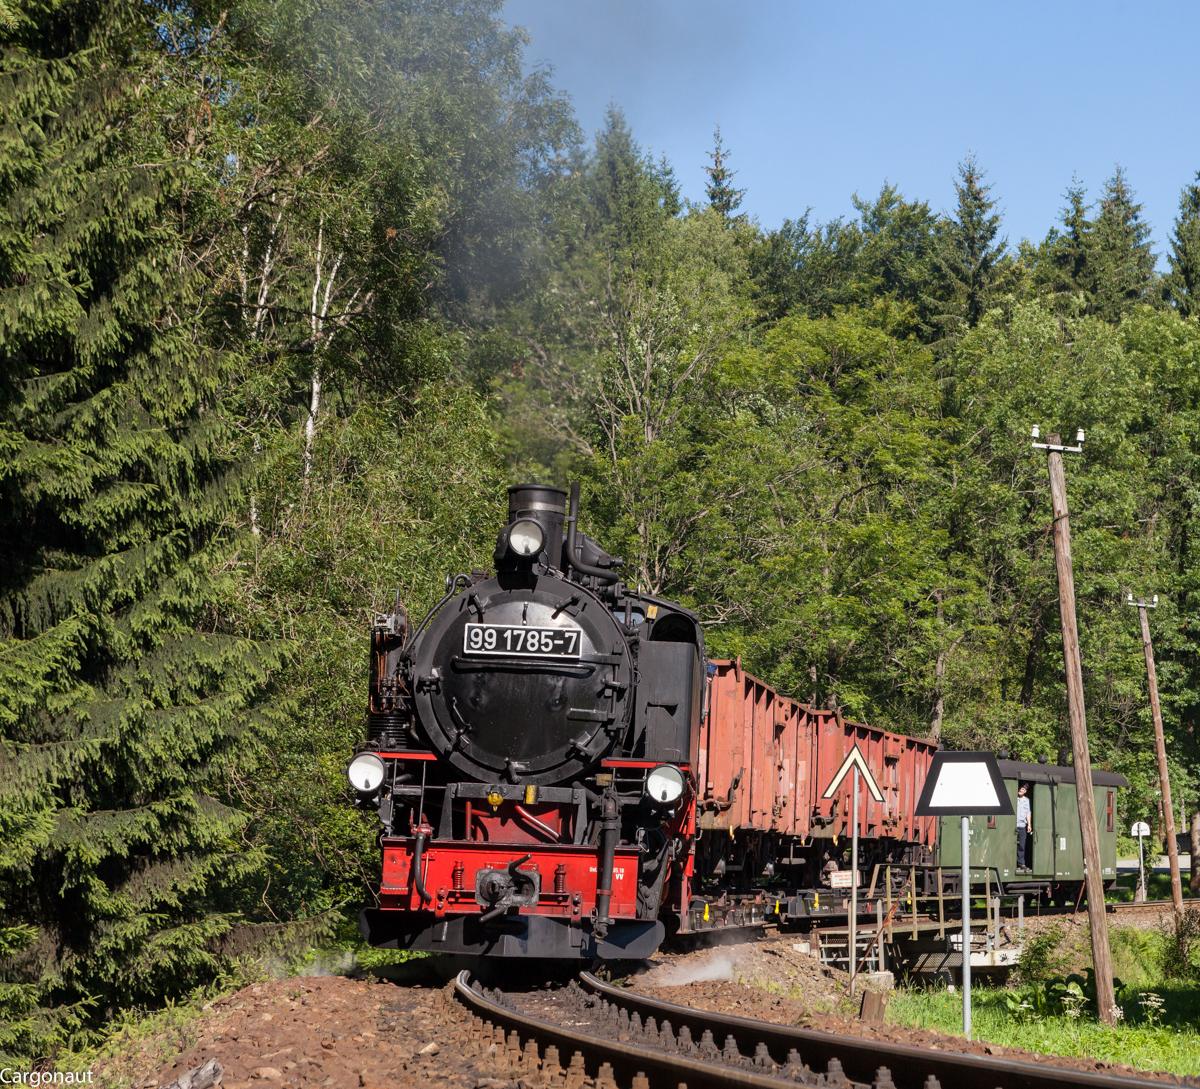 http://www.cargonautus.de/Bilder/Dampflok/99_1785_Vierenstrasse_Ng9023_KBS518_300717.jpg